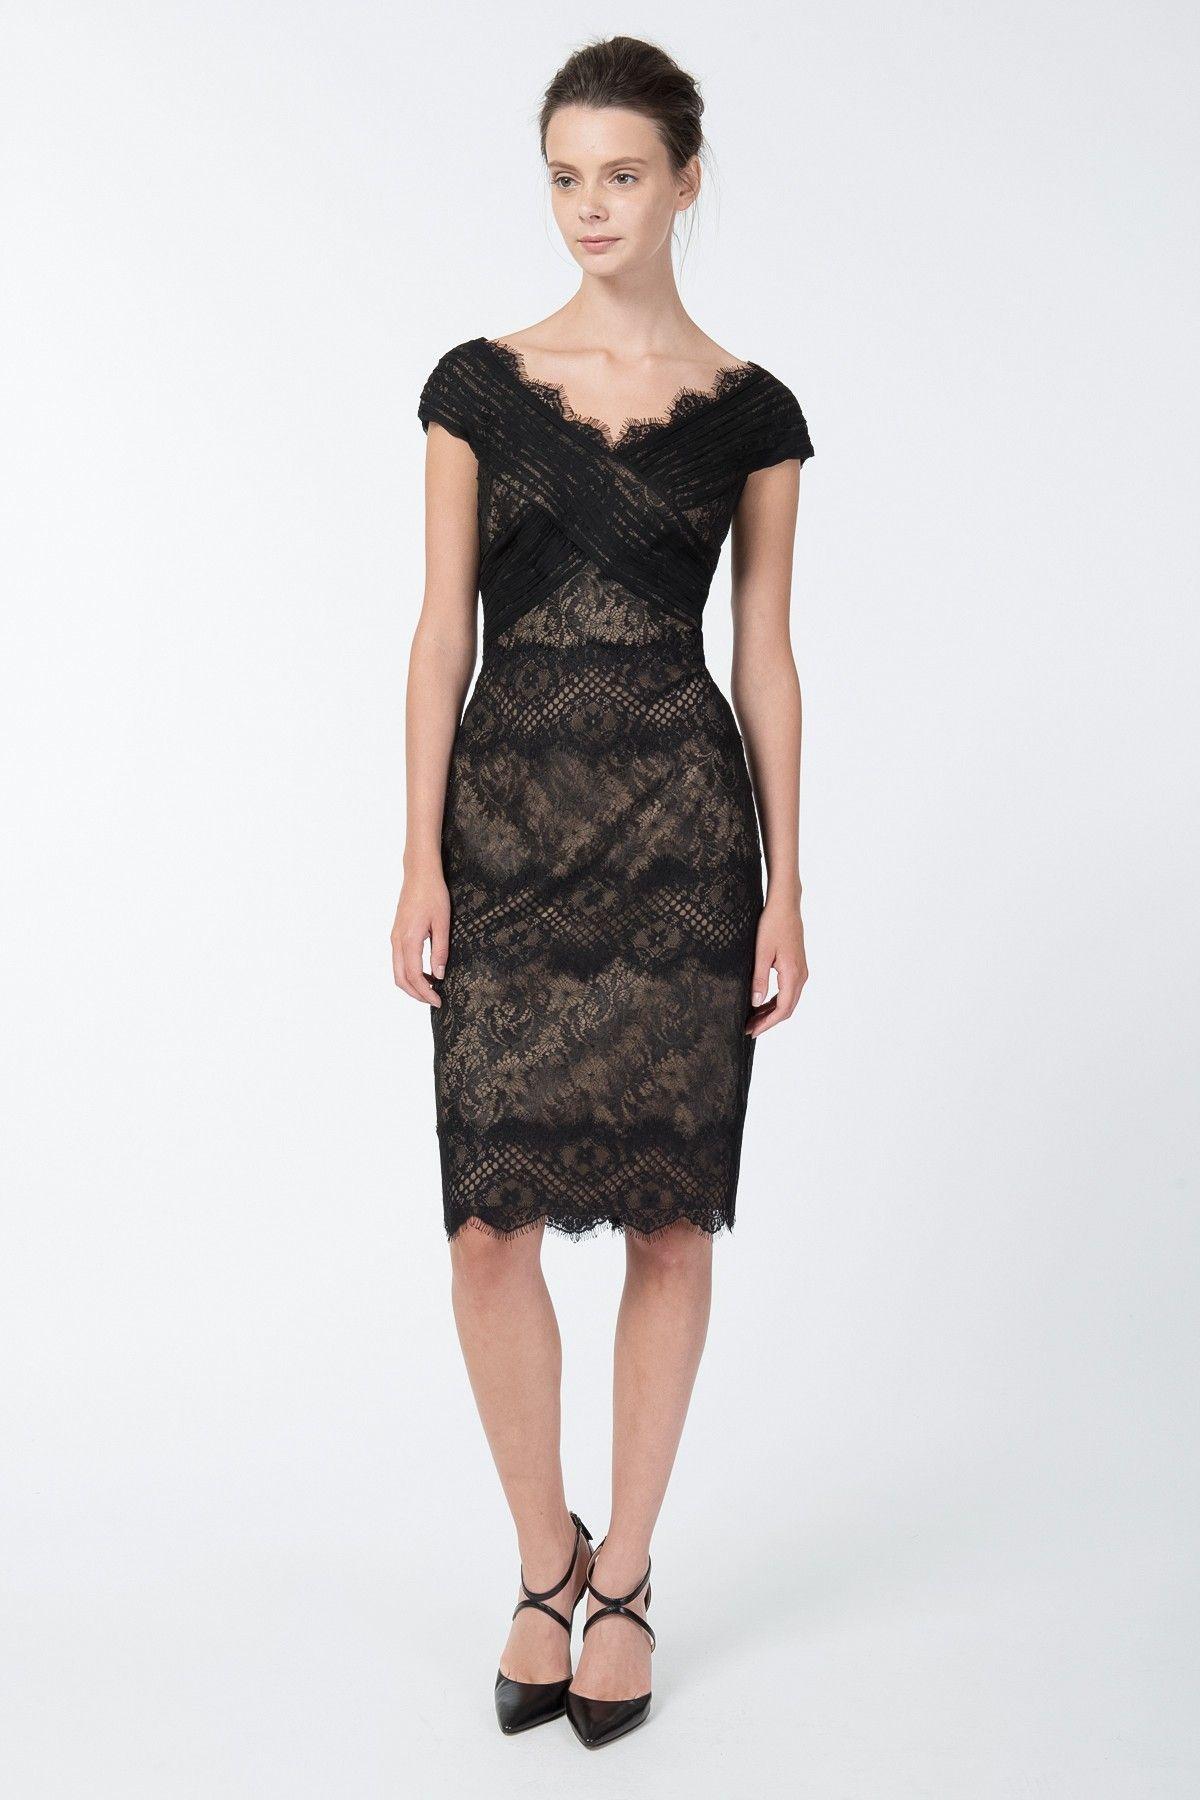 Chantilly lace scallop vneck dress in black nude tadashi shoji